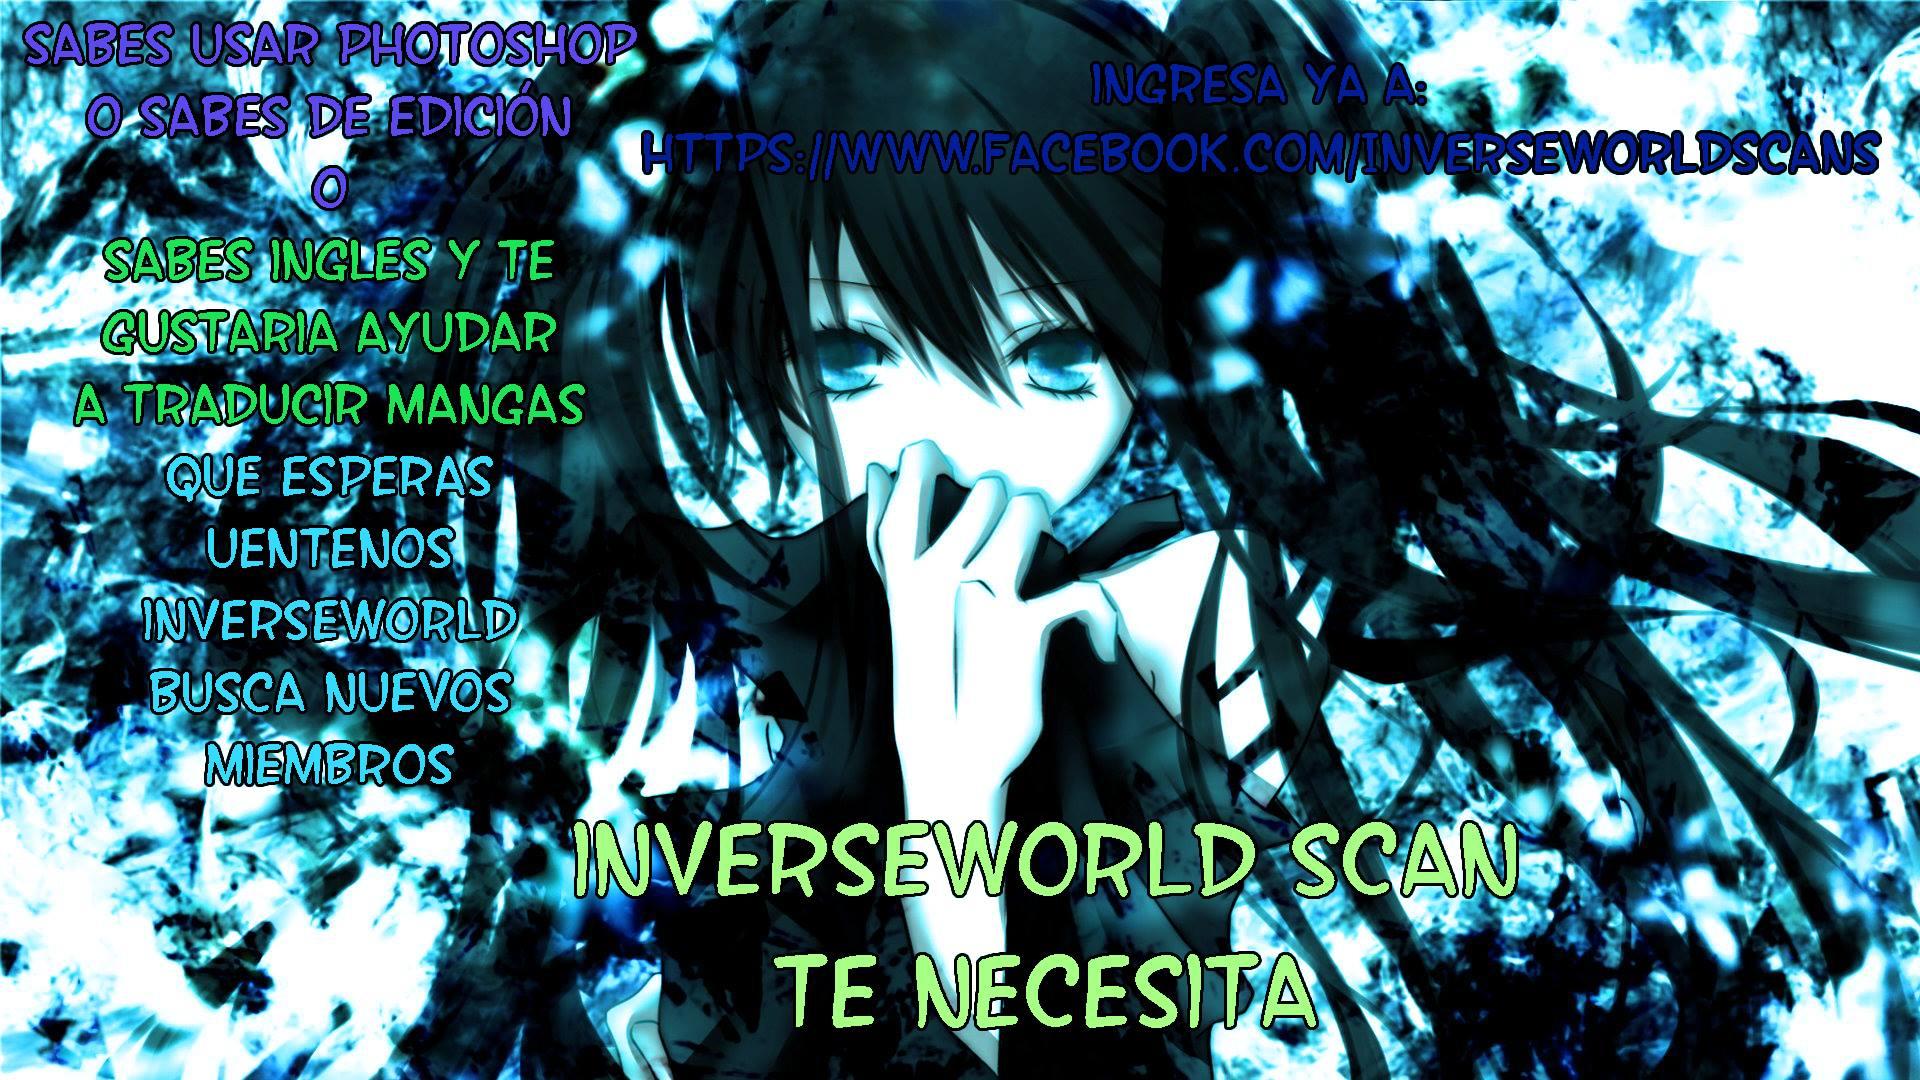 https://c5.mangatag.com/es_manga/18/16210/415301/b48c62590e6d0cda7b99d3c4053a412b.jpg Page 1